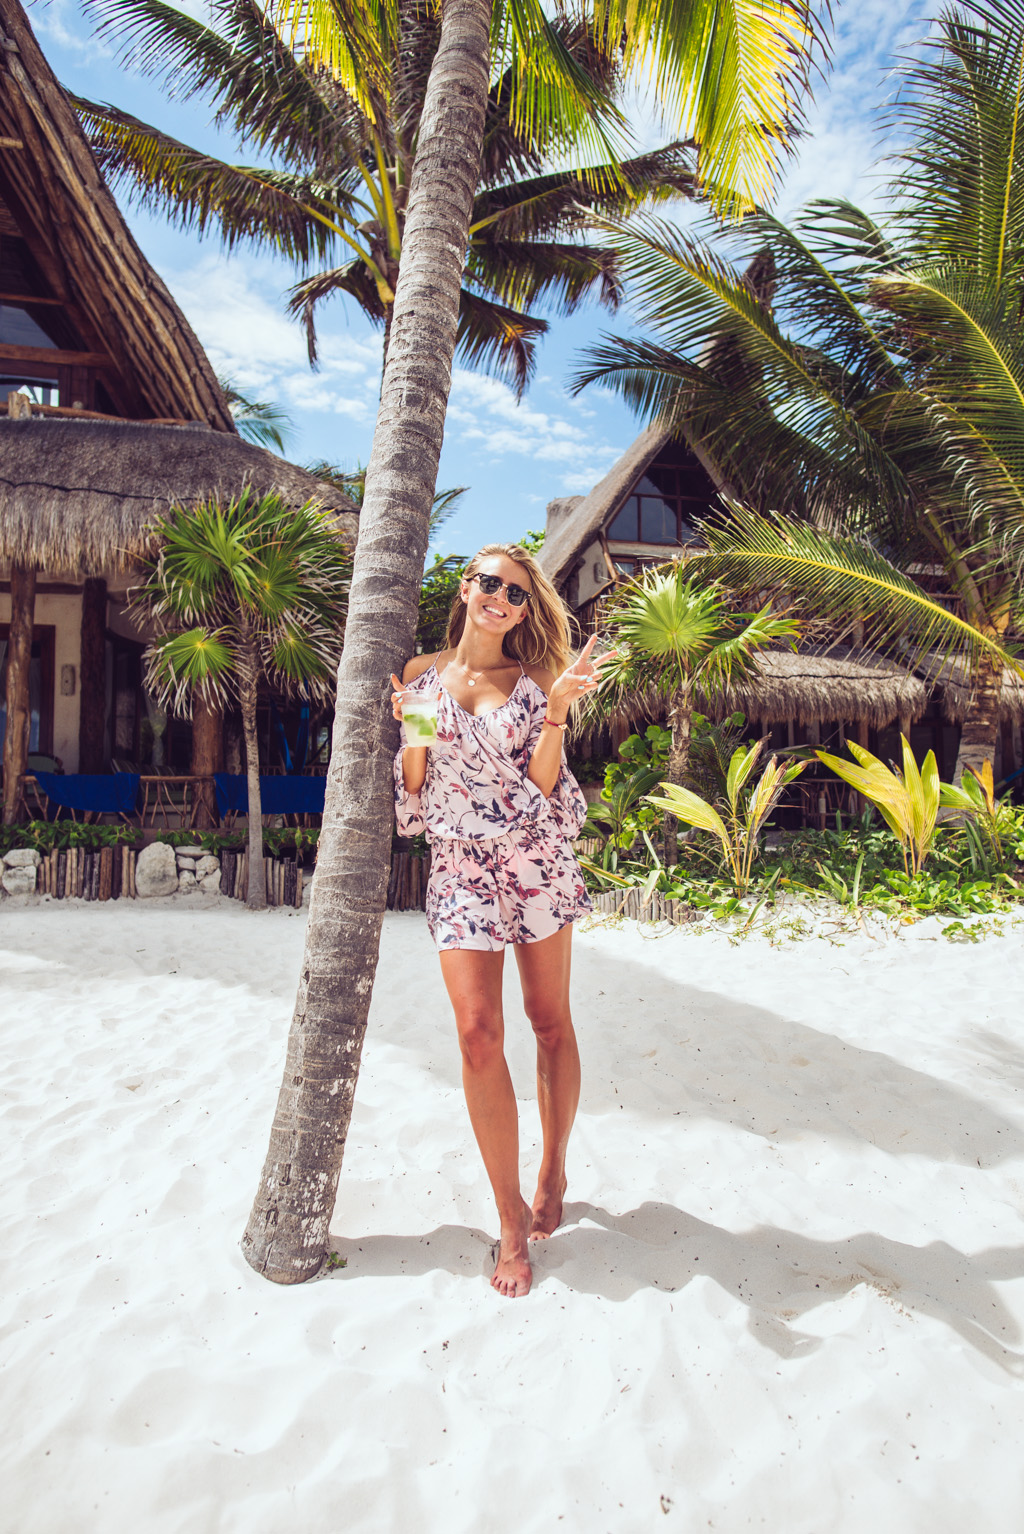 janni-deler-beachdress-lindexDSC_2990